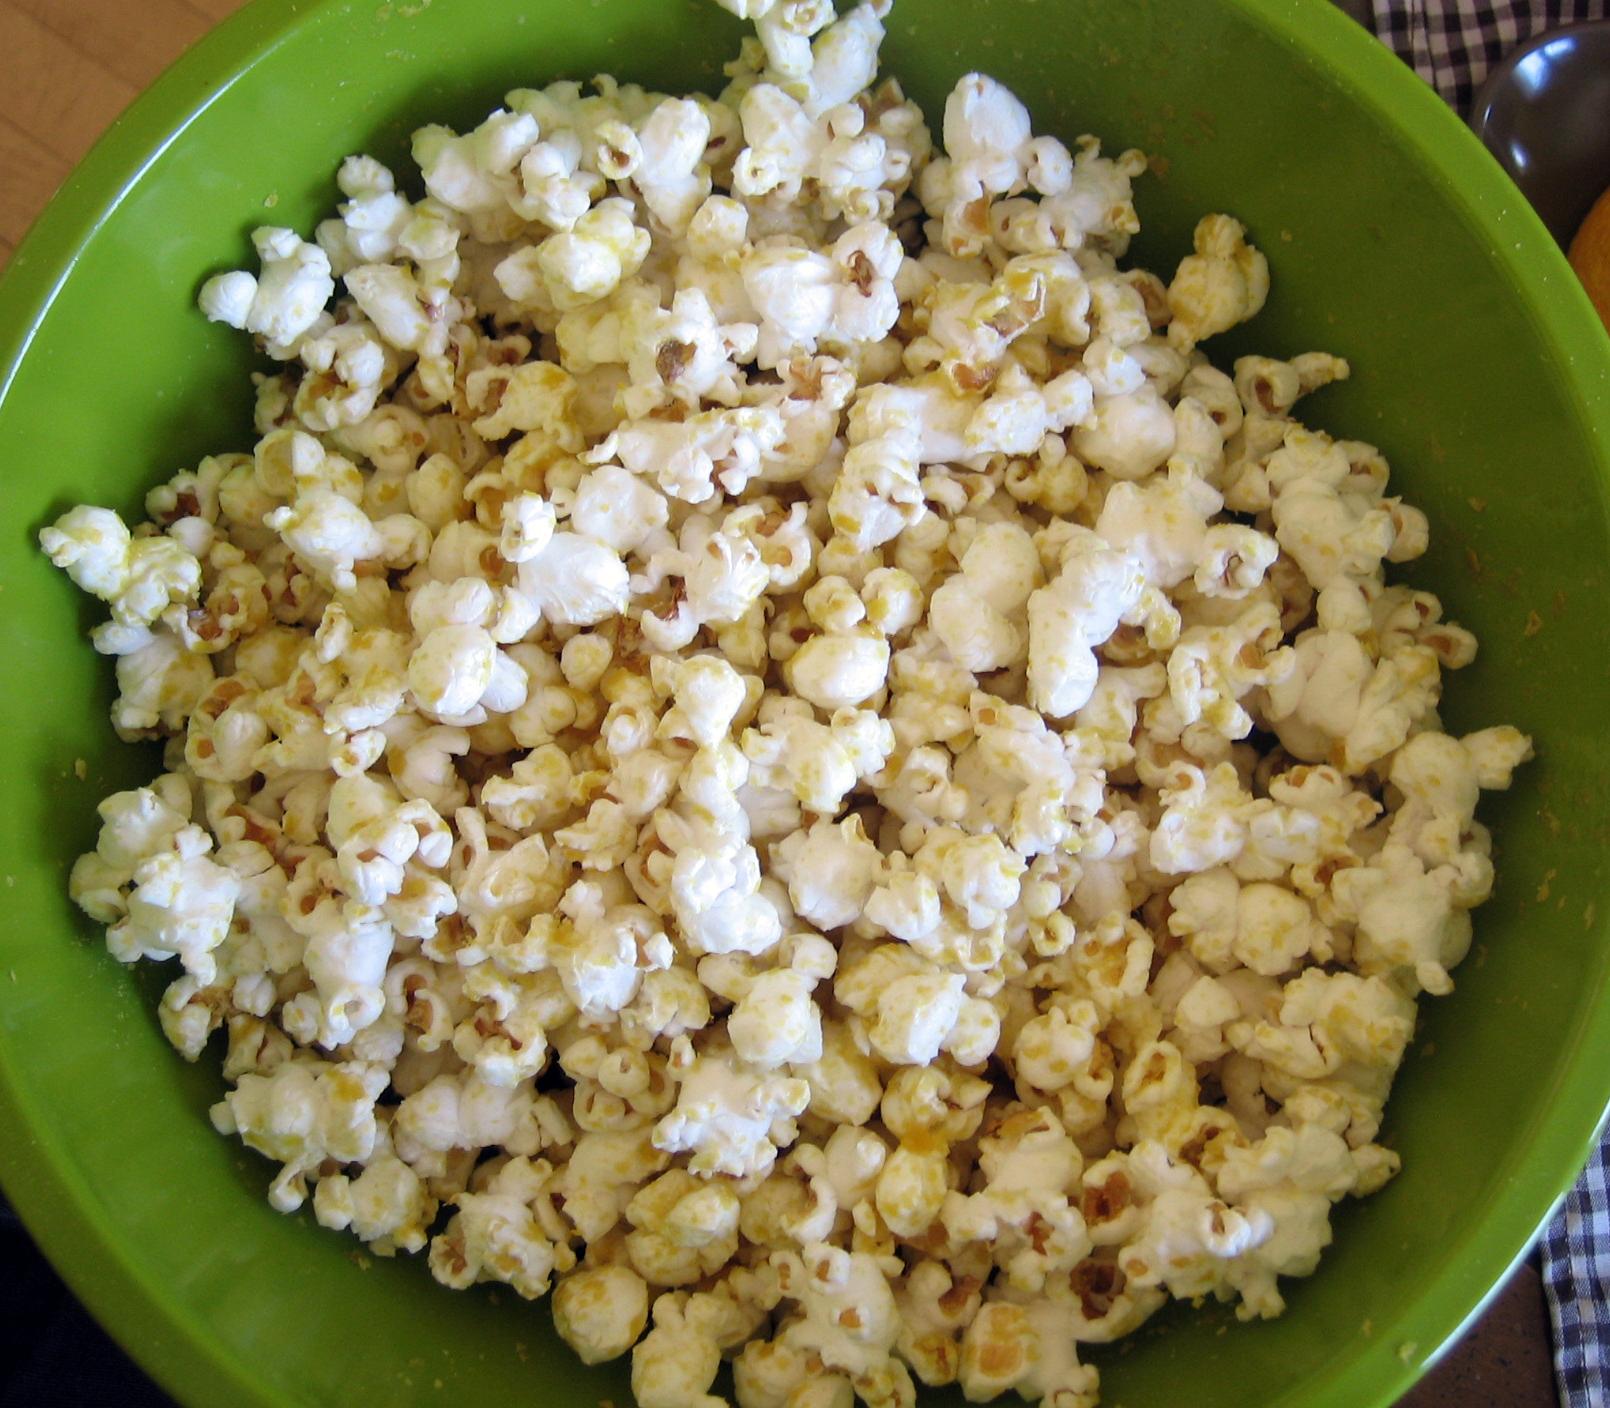 cheezycorn